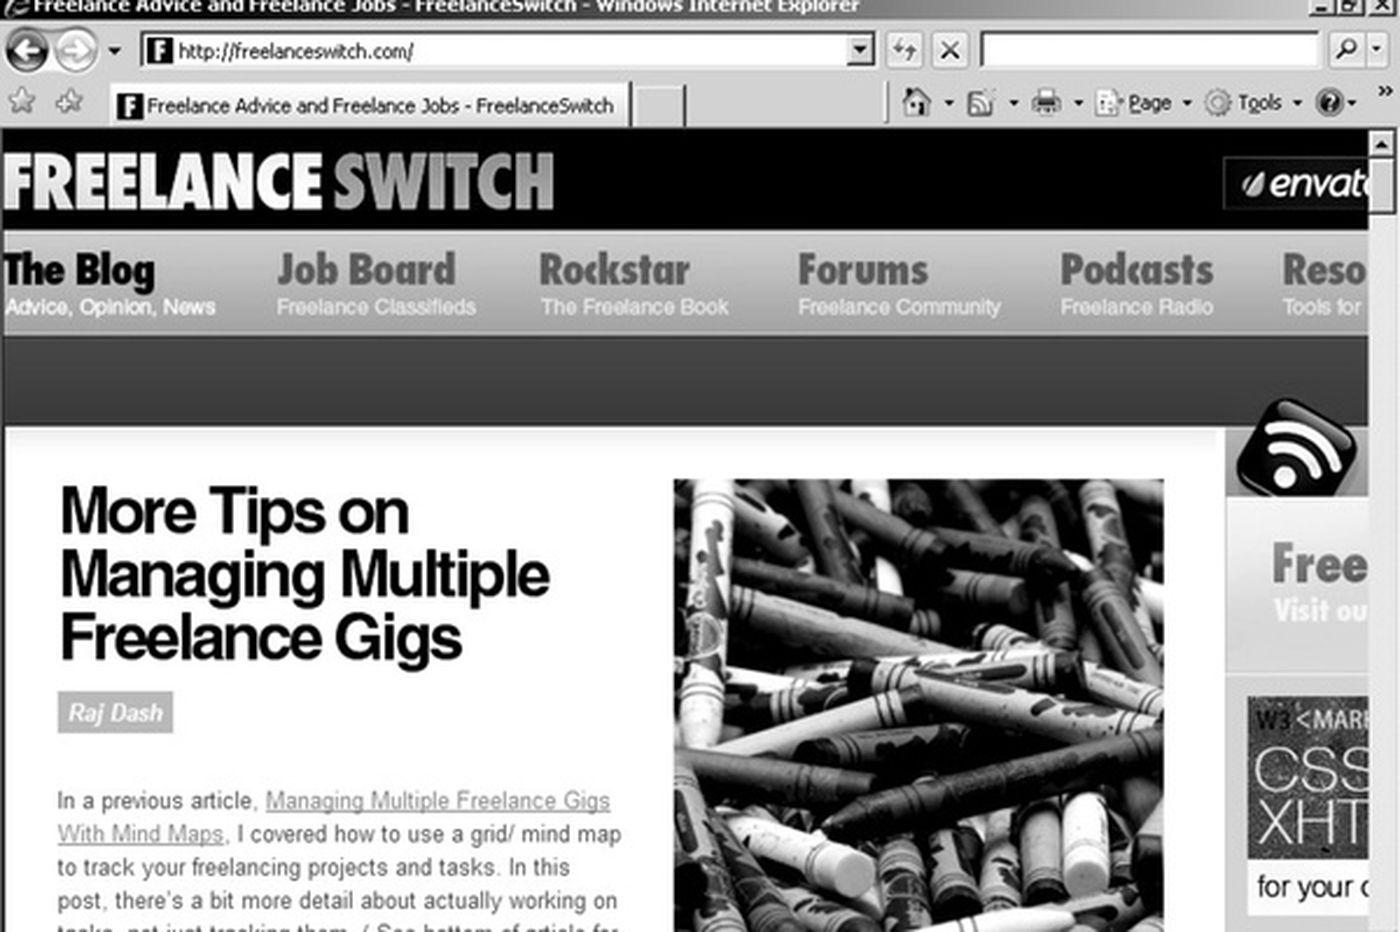 Web Wealth: Freelance work